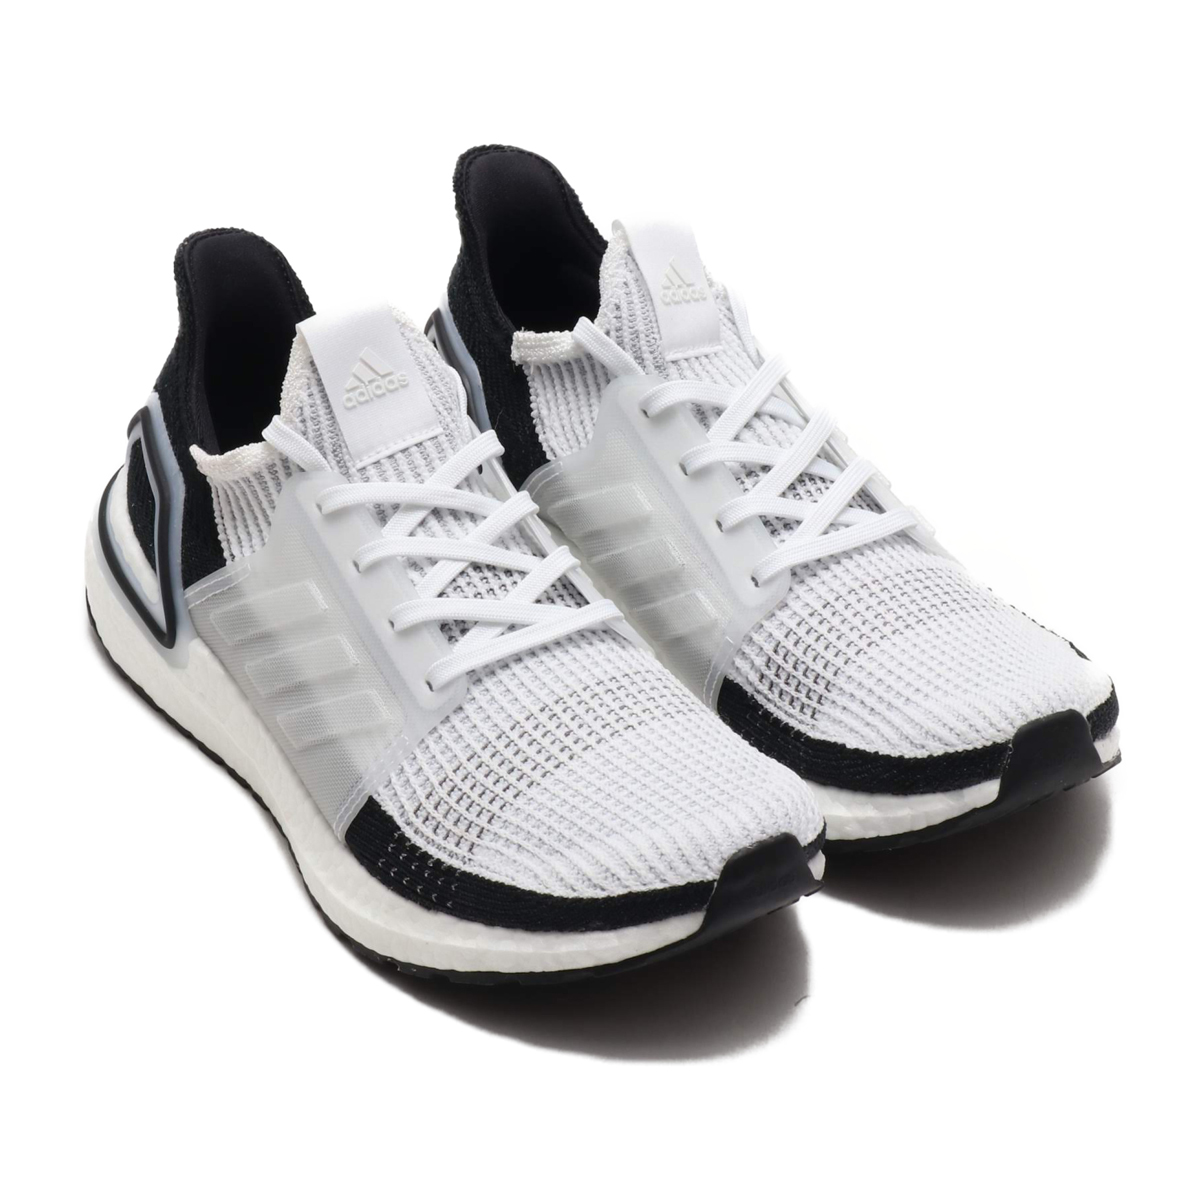 adidas UltraBOOST 19 (RUNNING WHITE RUNNING WHITE GREY TWO) (Adidas ultra  boost 19) e49e716dc